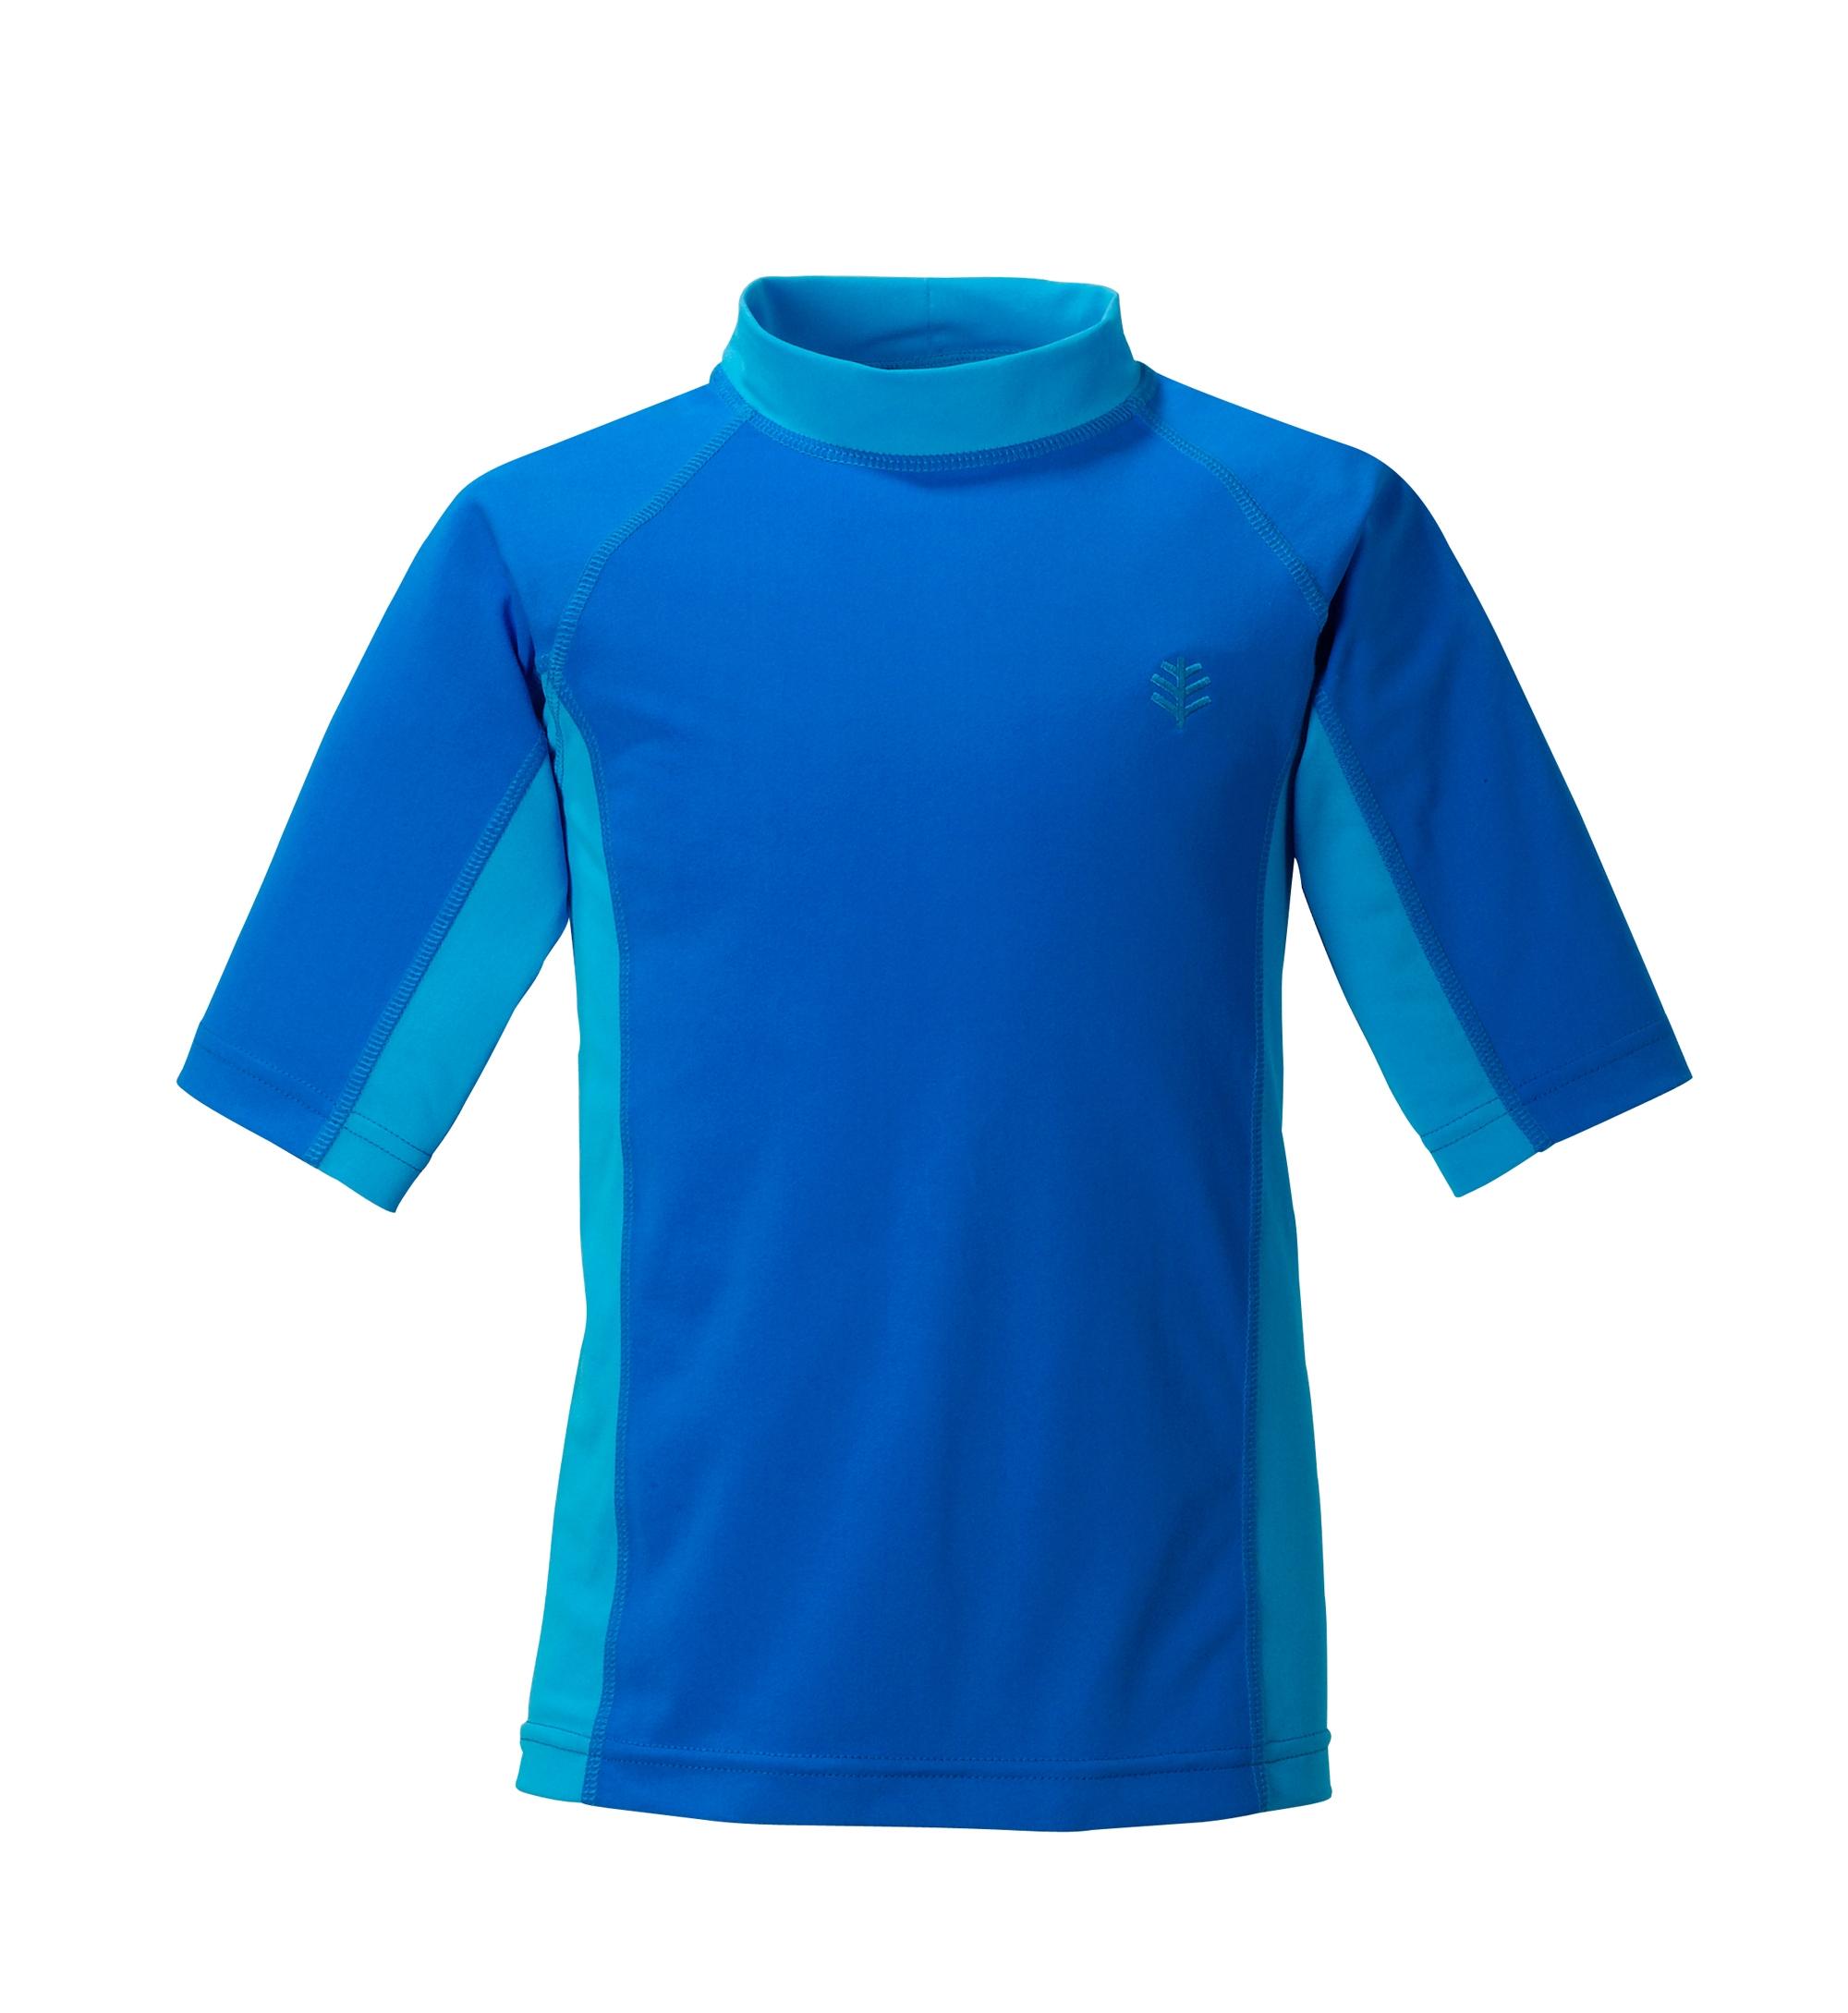 tops tees polos sun protective clothing coolibar 2015